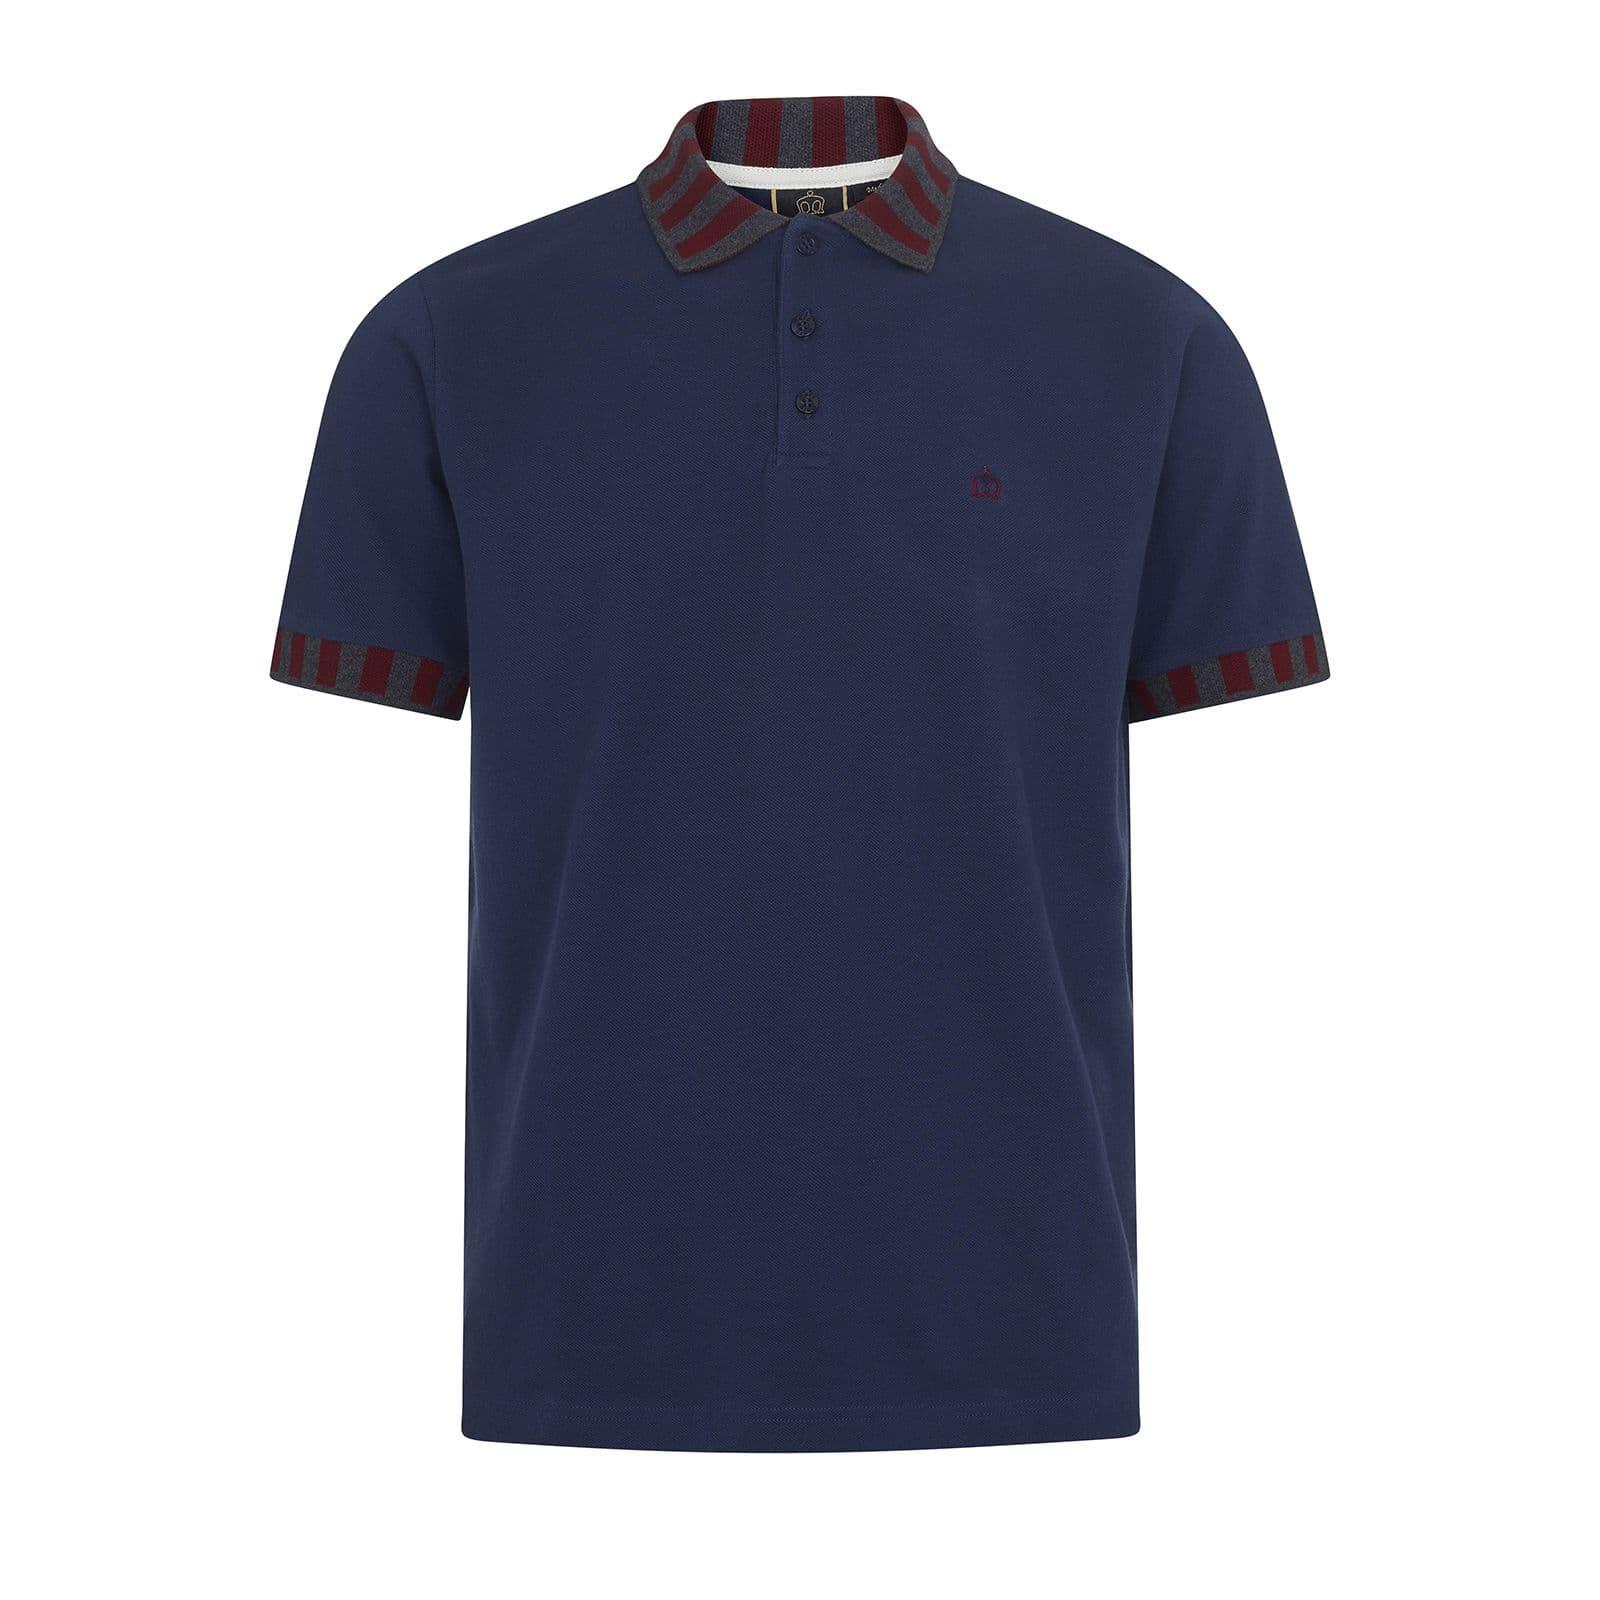 Рубашка Поло ConnellПоло под заказ<br><br><br>Артикул: 1917202<br>Материал: 100% хлопок<br>Цвет: синий<br>Пол: Мужской